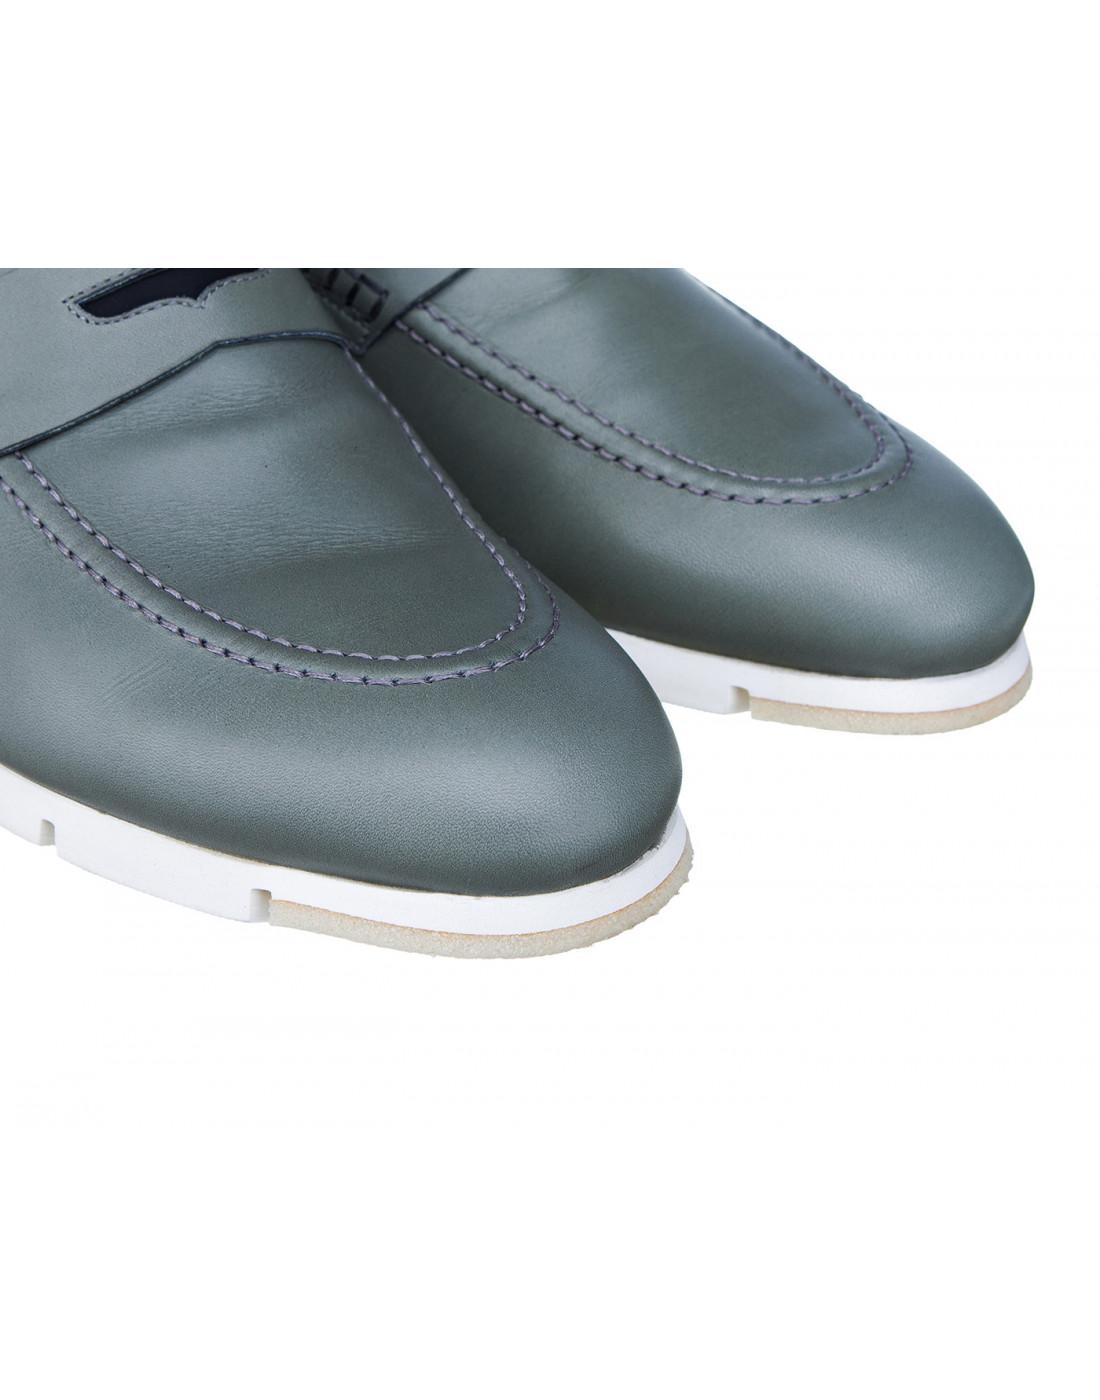 Туфли серые мужские A.Guardiani S76032S-4